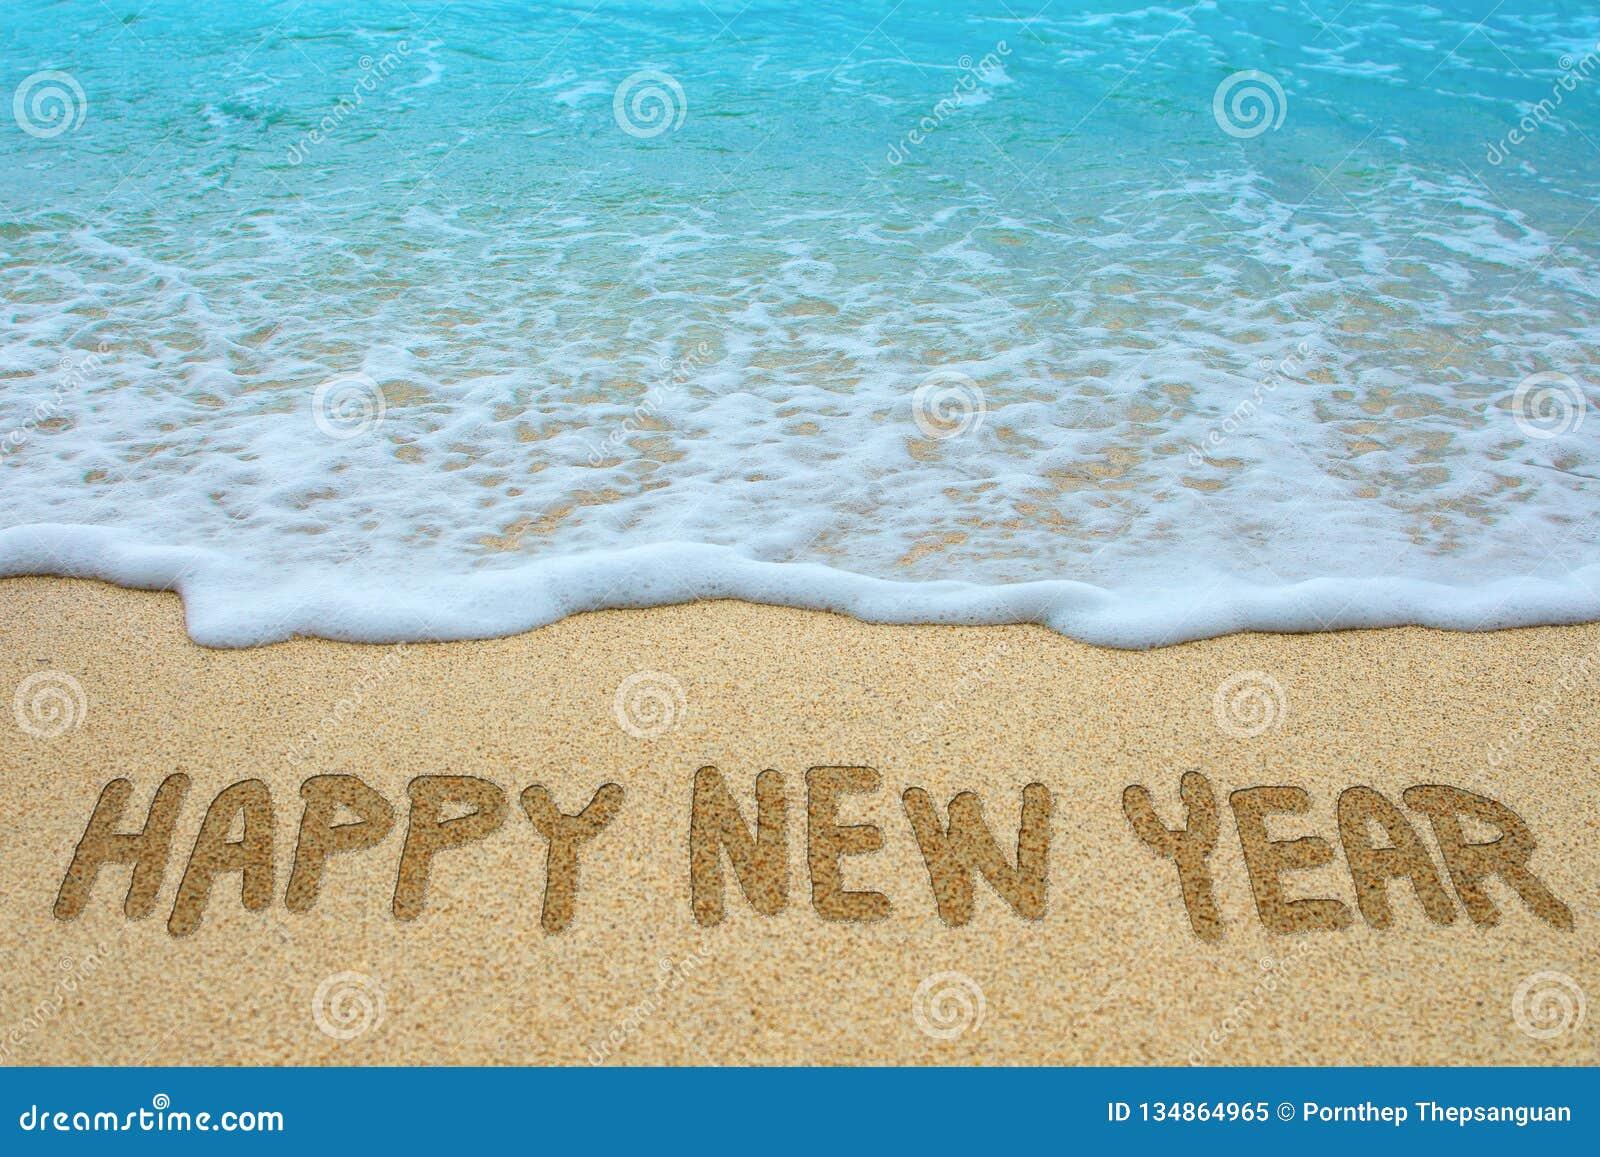 Happy new year written on sandy beach